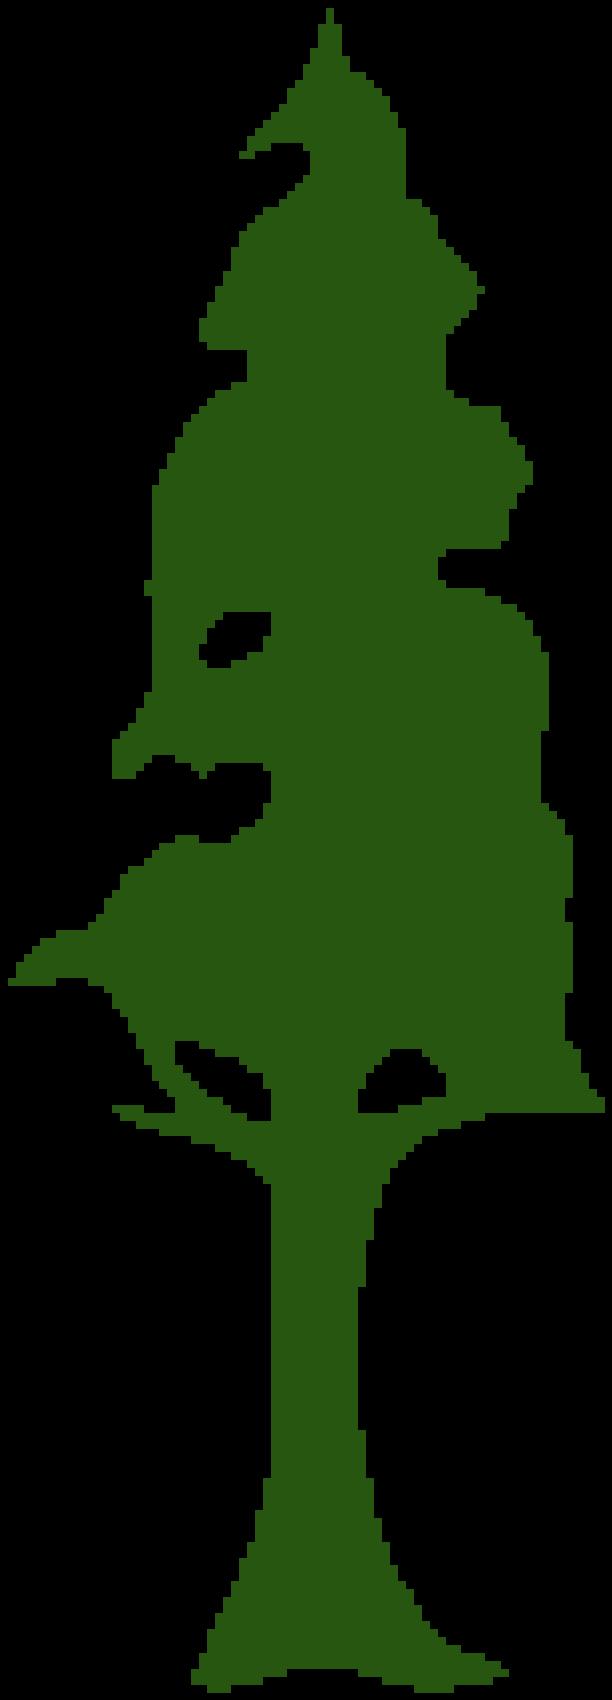 Cypress Tree Clip Art - ClipArt Best - ClipArt Best